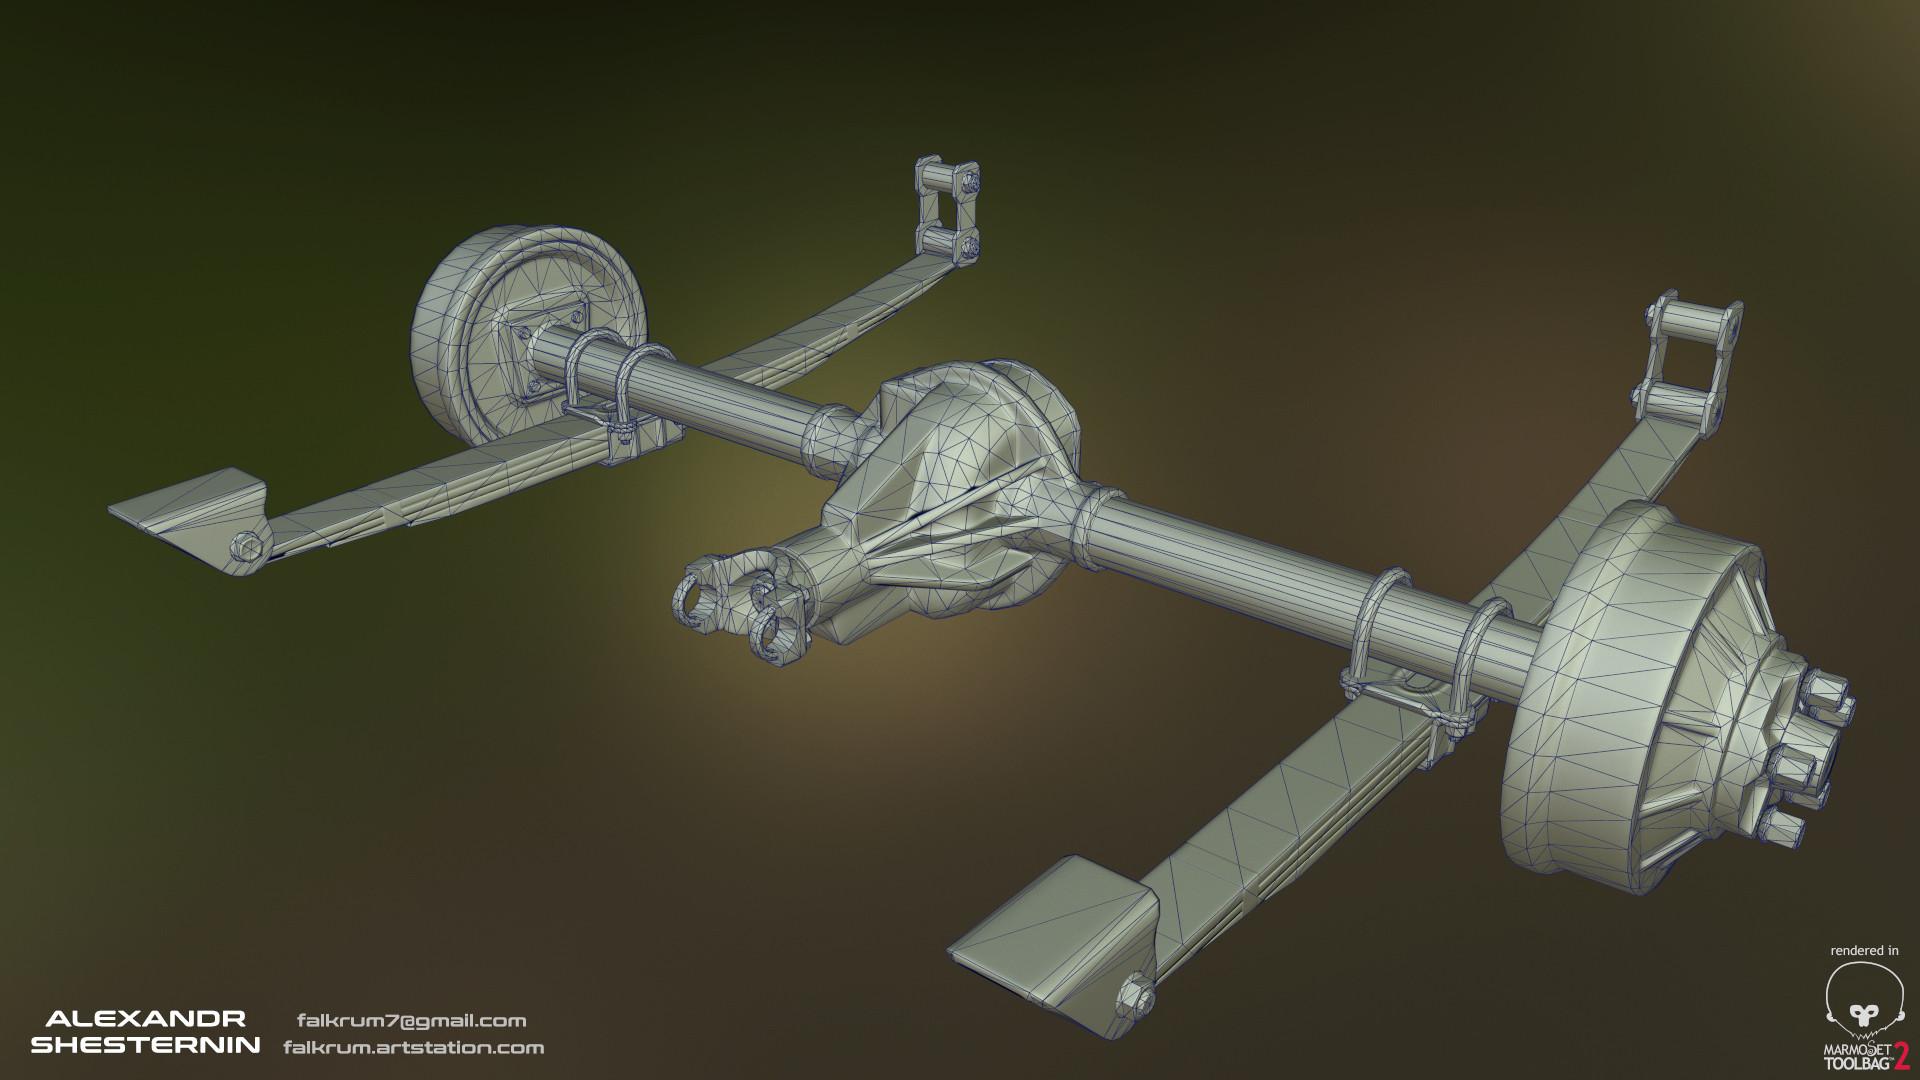 Alexandr shesternin rear axle02